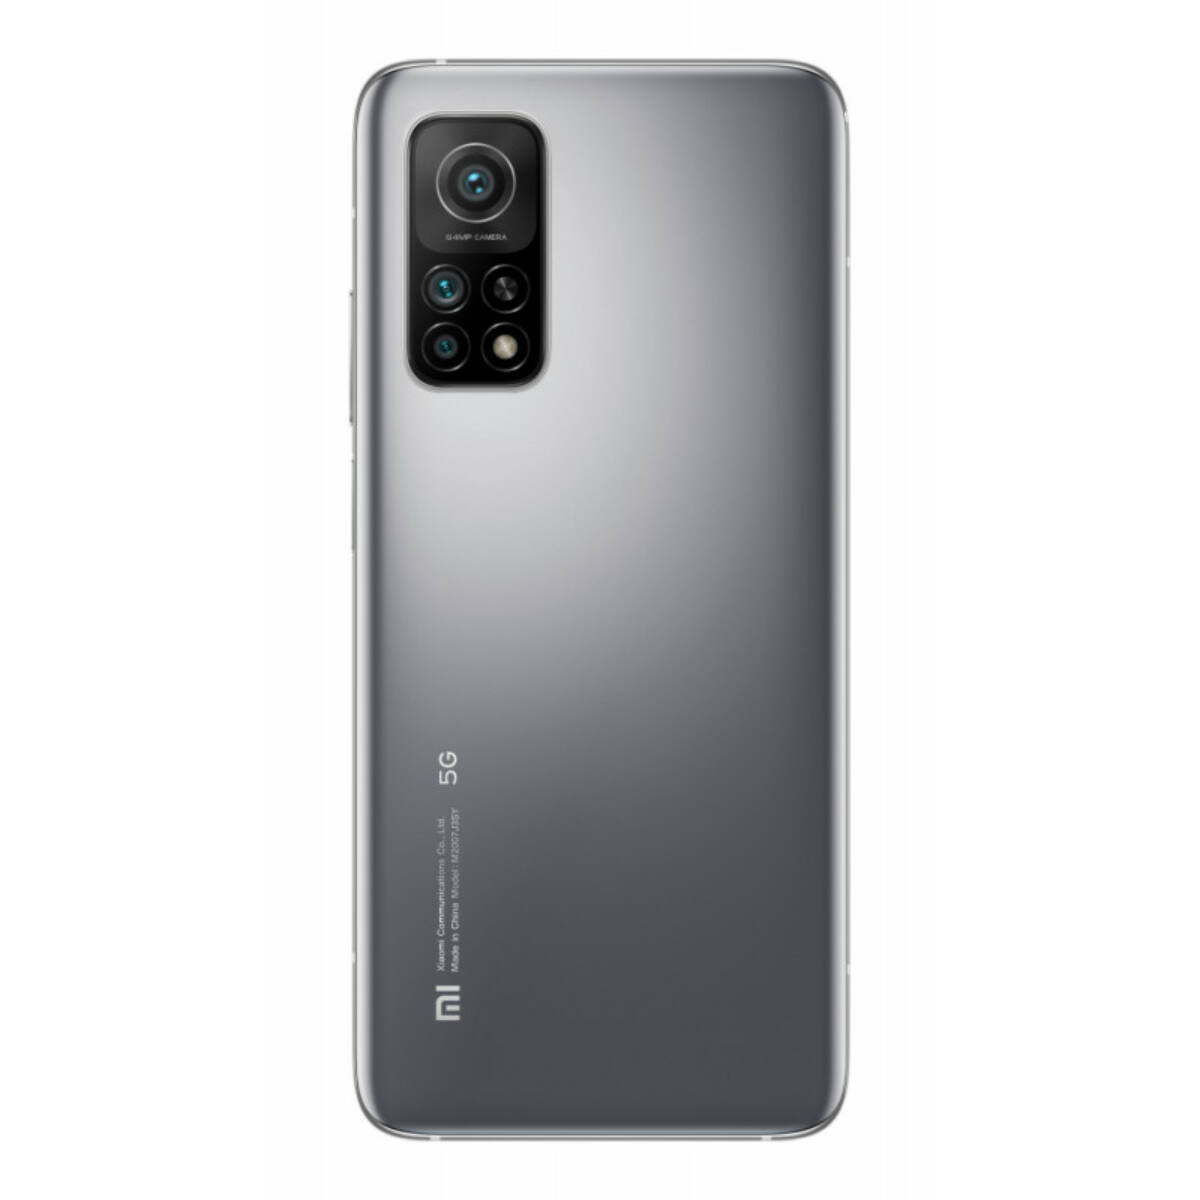 Xiaomi Mi 10T Dual SIM 8GB RAM 128GB mobiltelefon, ezüst  EU